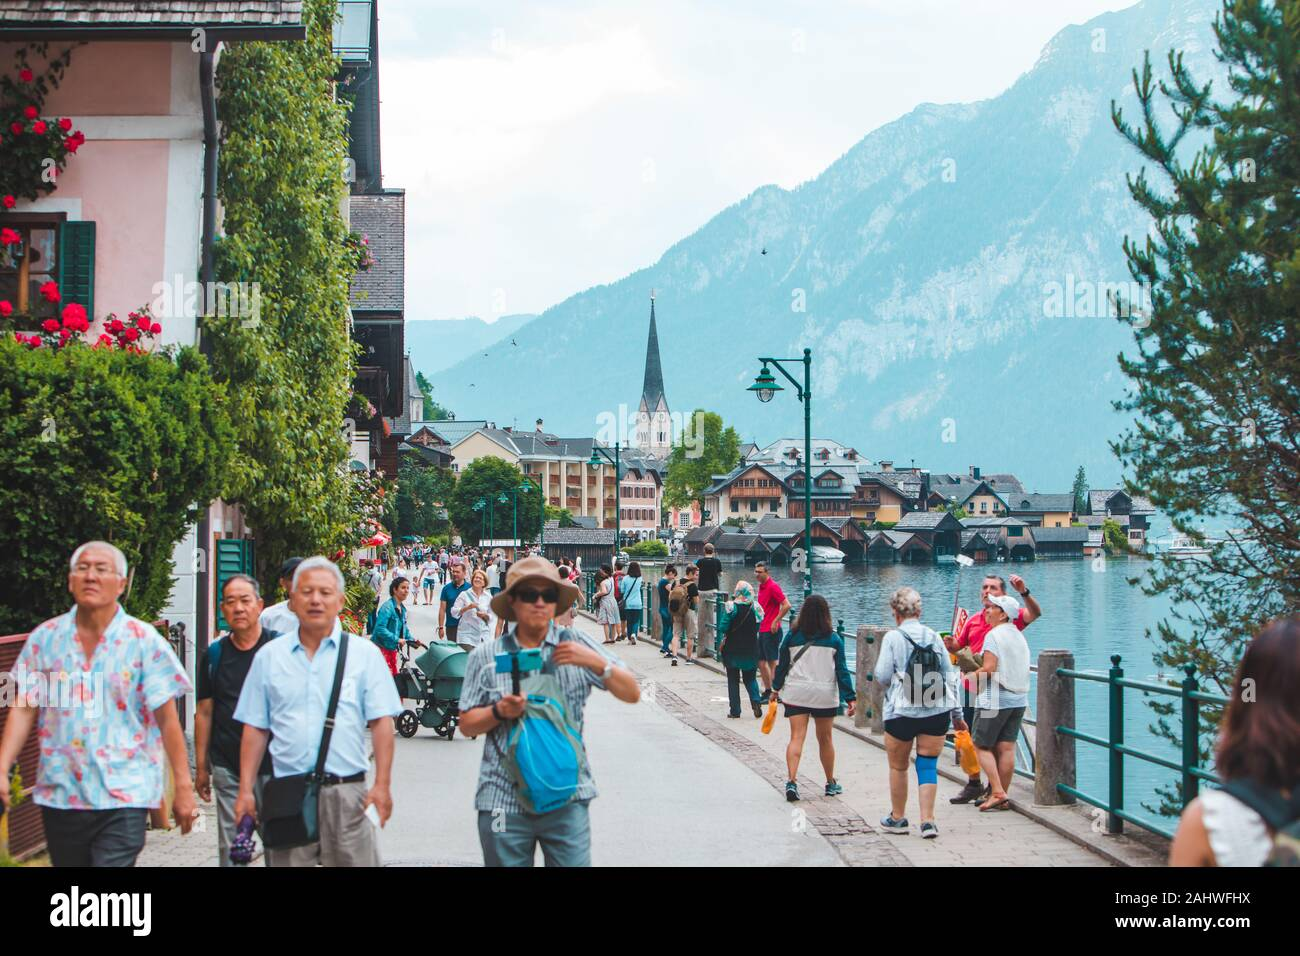 Hallstatt, Austria - June 15, 2019: people walking by city quay enjoying the view Stock Photo